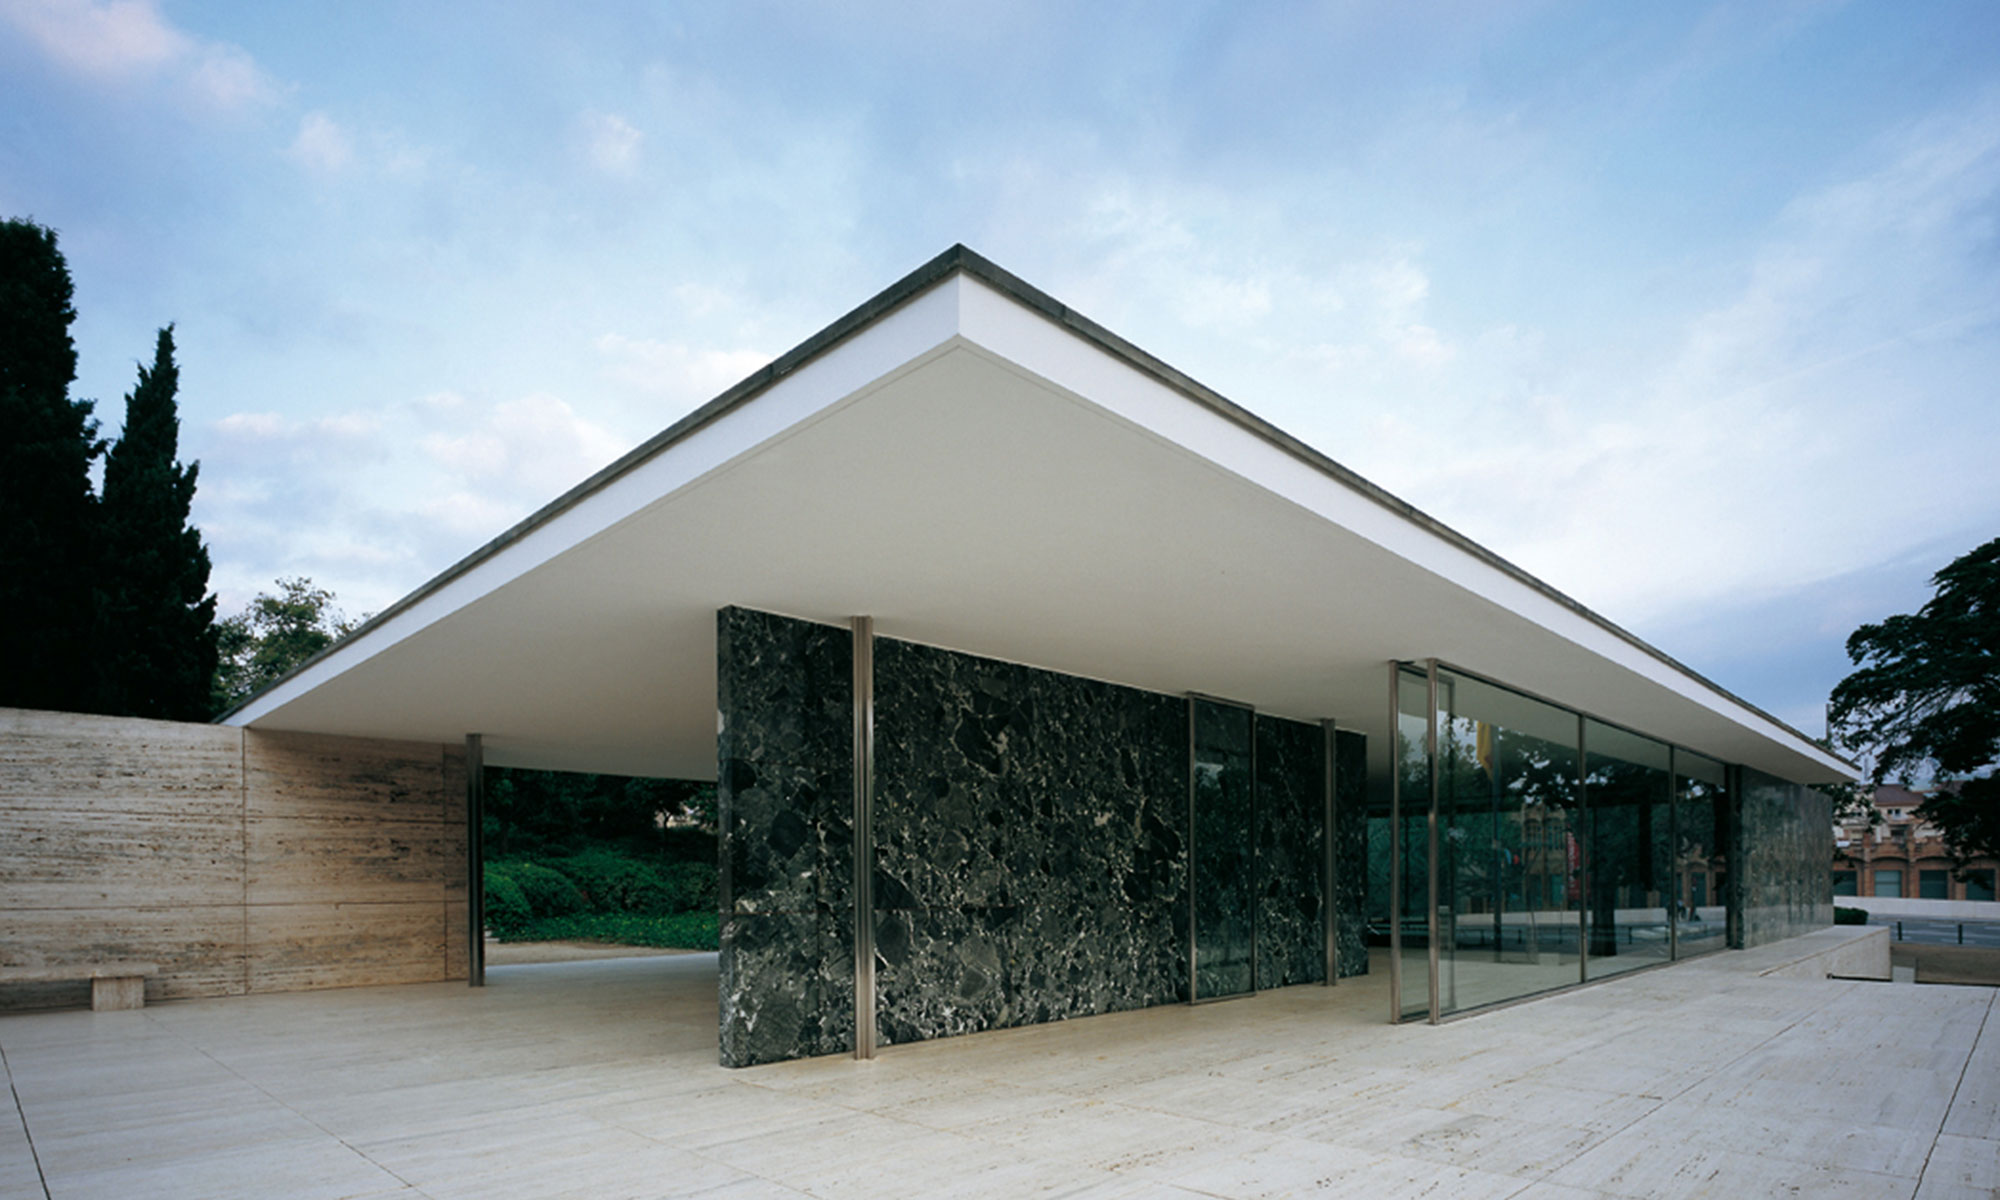 Pabellon Mies Barcelona Bauhaus | Molins Design interioristas